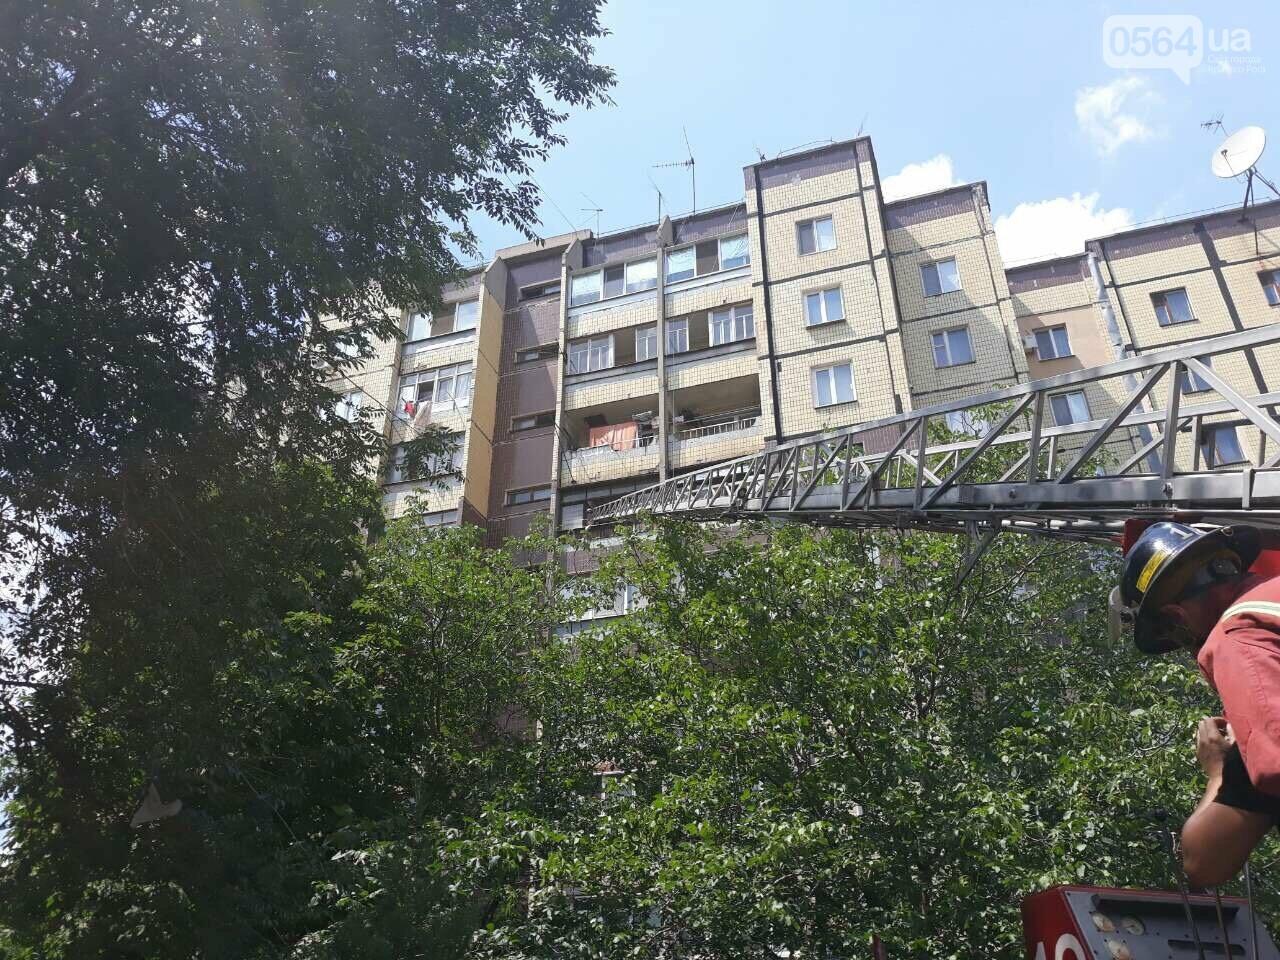 Один дома: В Кривом Роге 4-летний мальчик оказался запертым на балконе 6 этажа, - ФОТО, ВИДЕО, фото-1